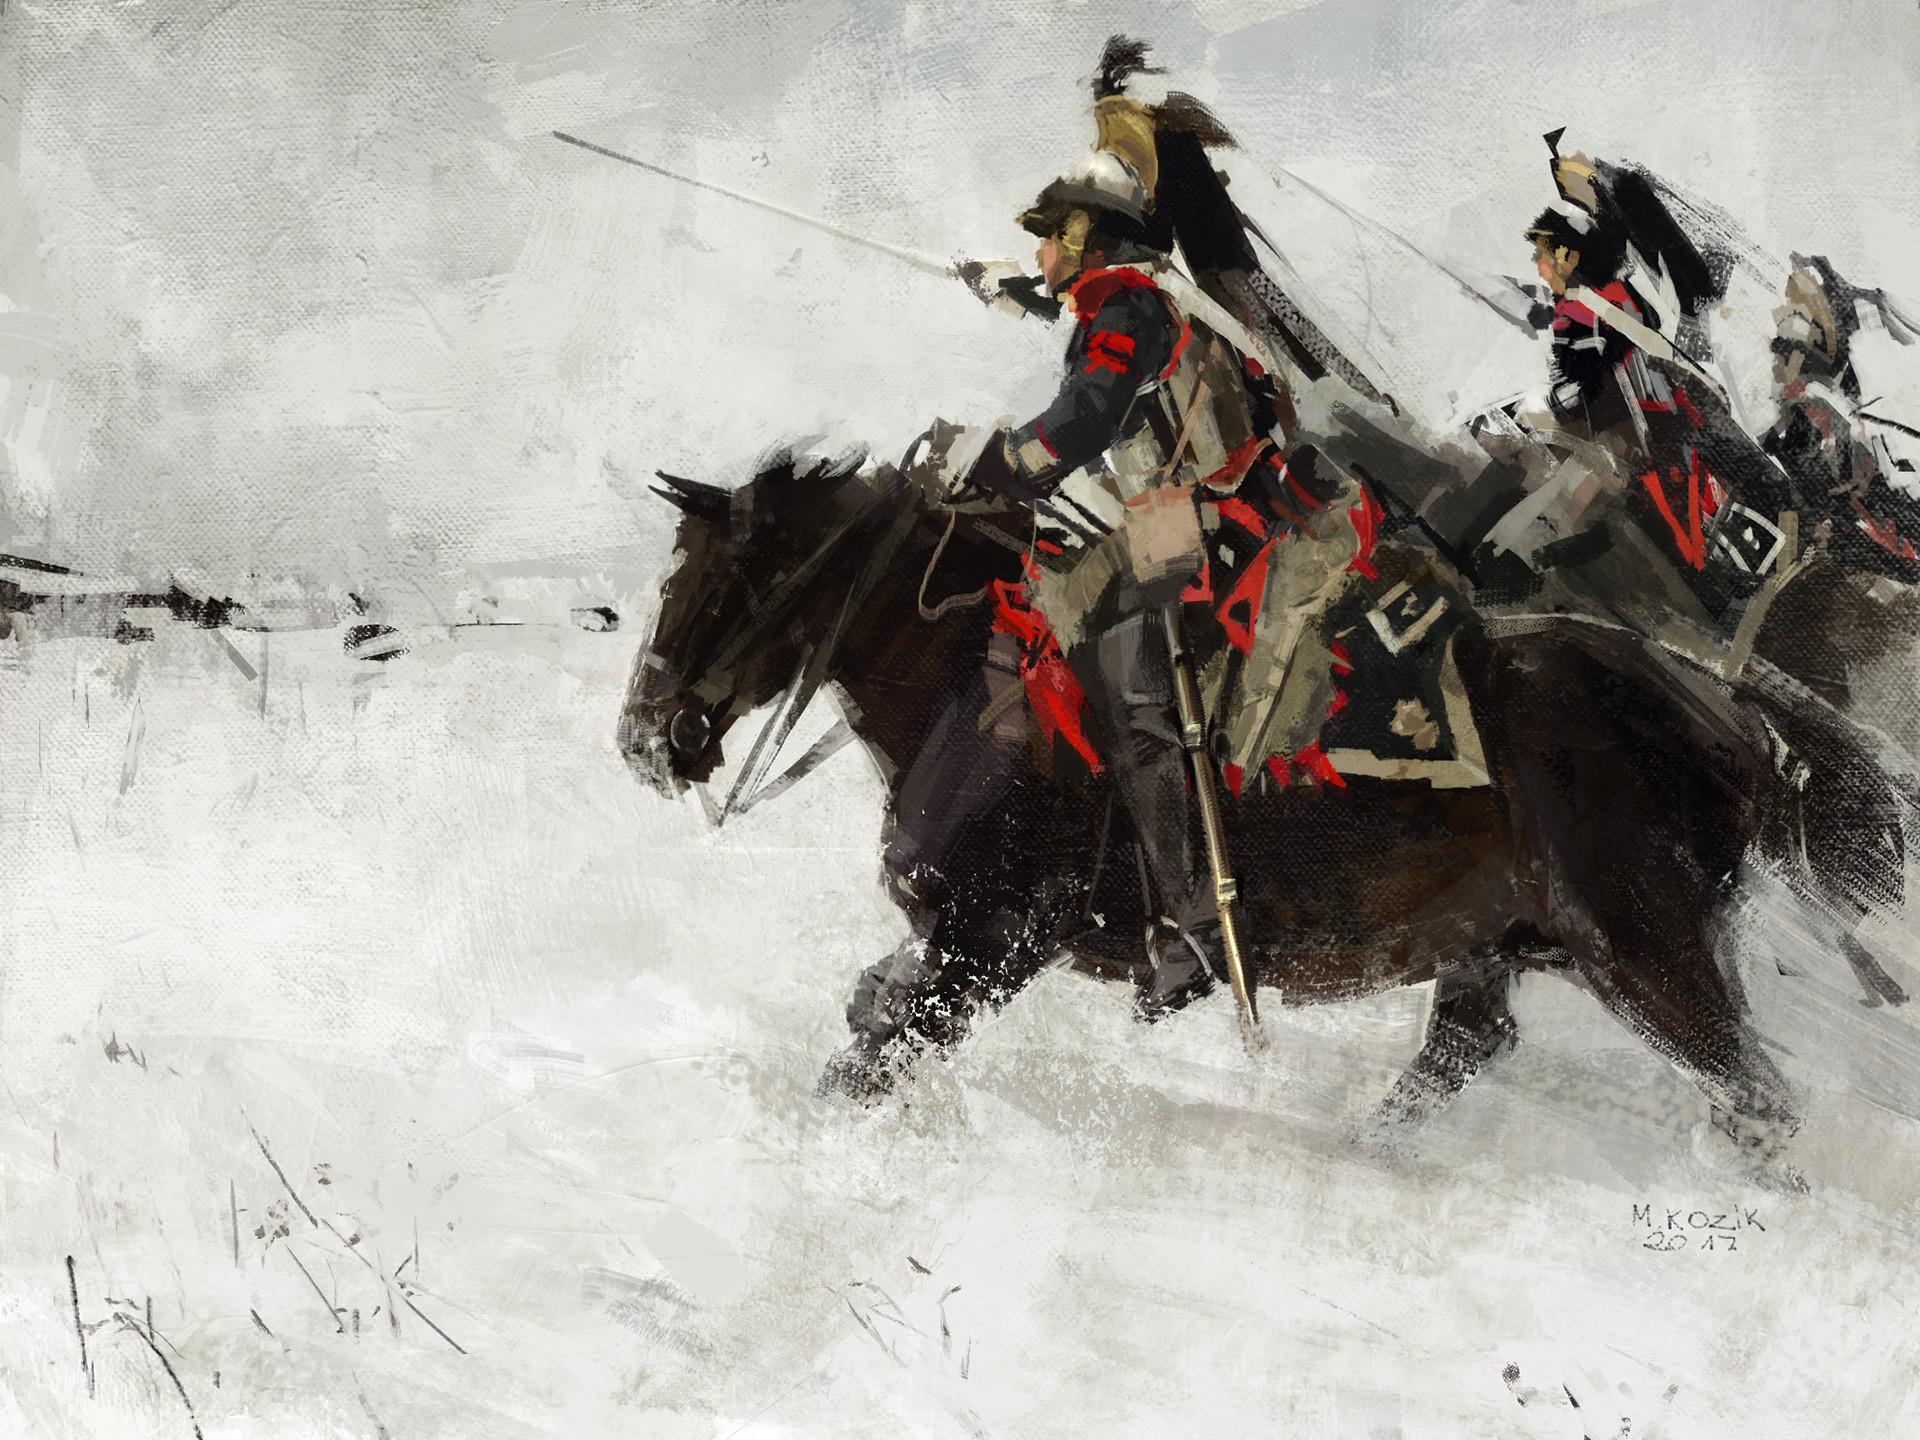 Mariusz kozik cuirassier snow fin 04